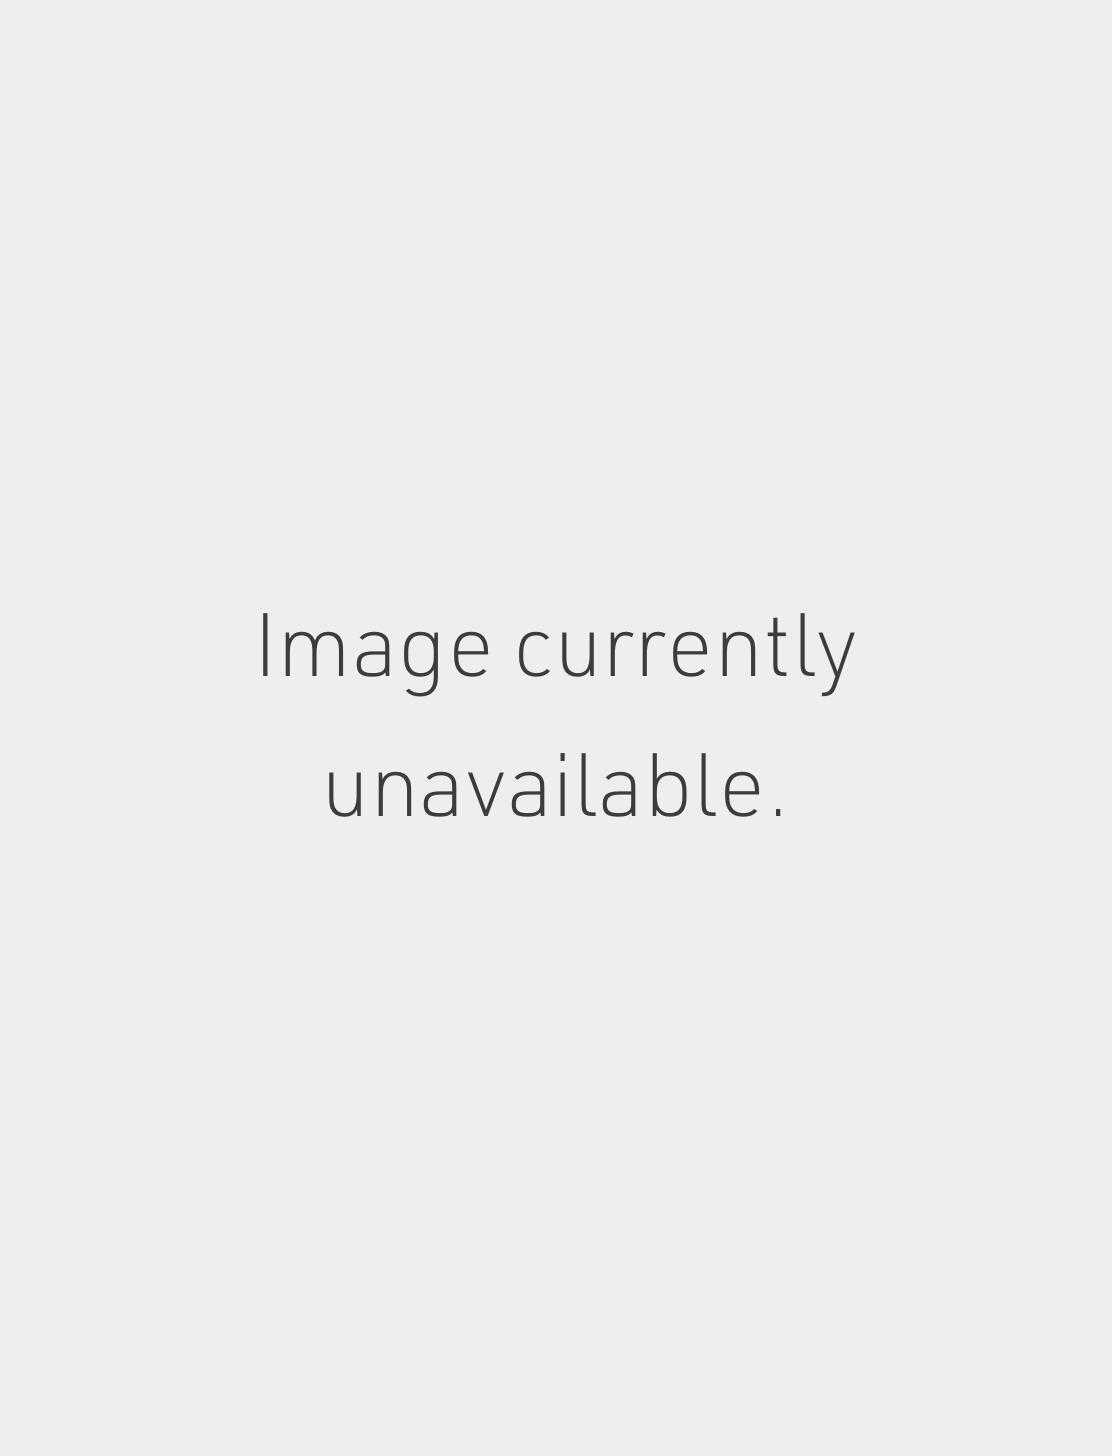 Invisible Set 3 Diamond Curve Tash Threaded St Image #1